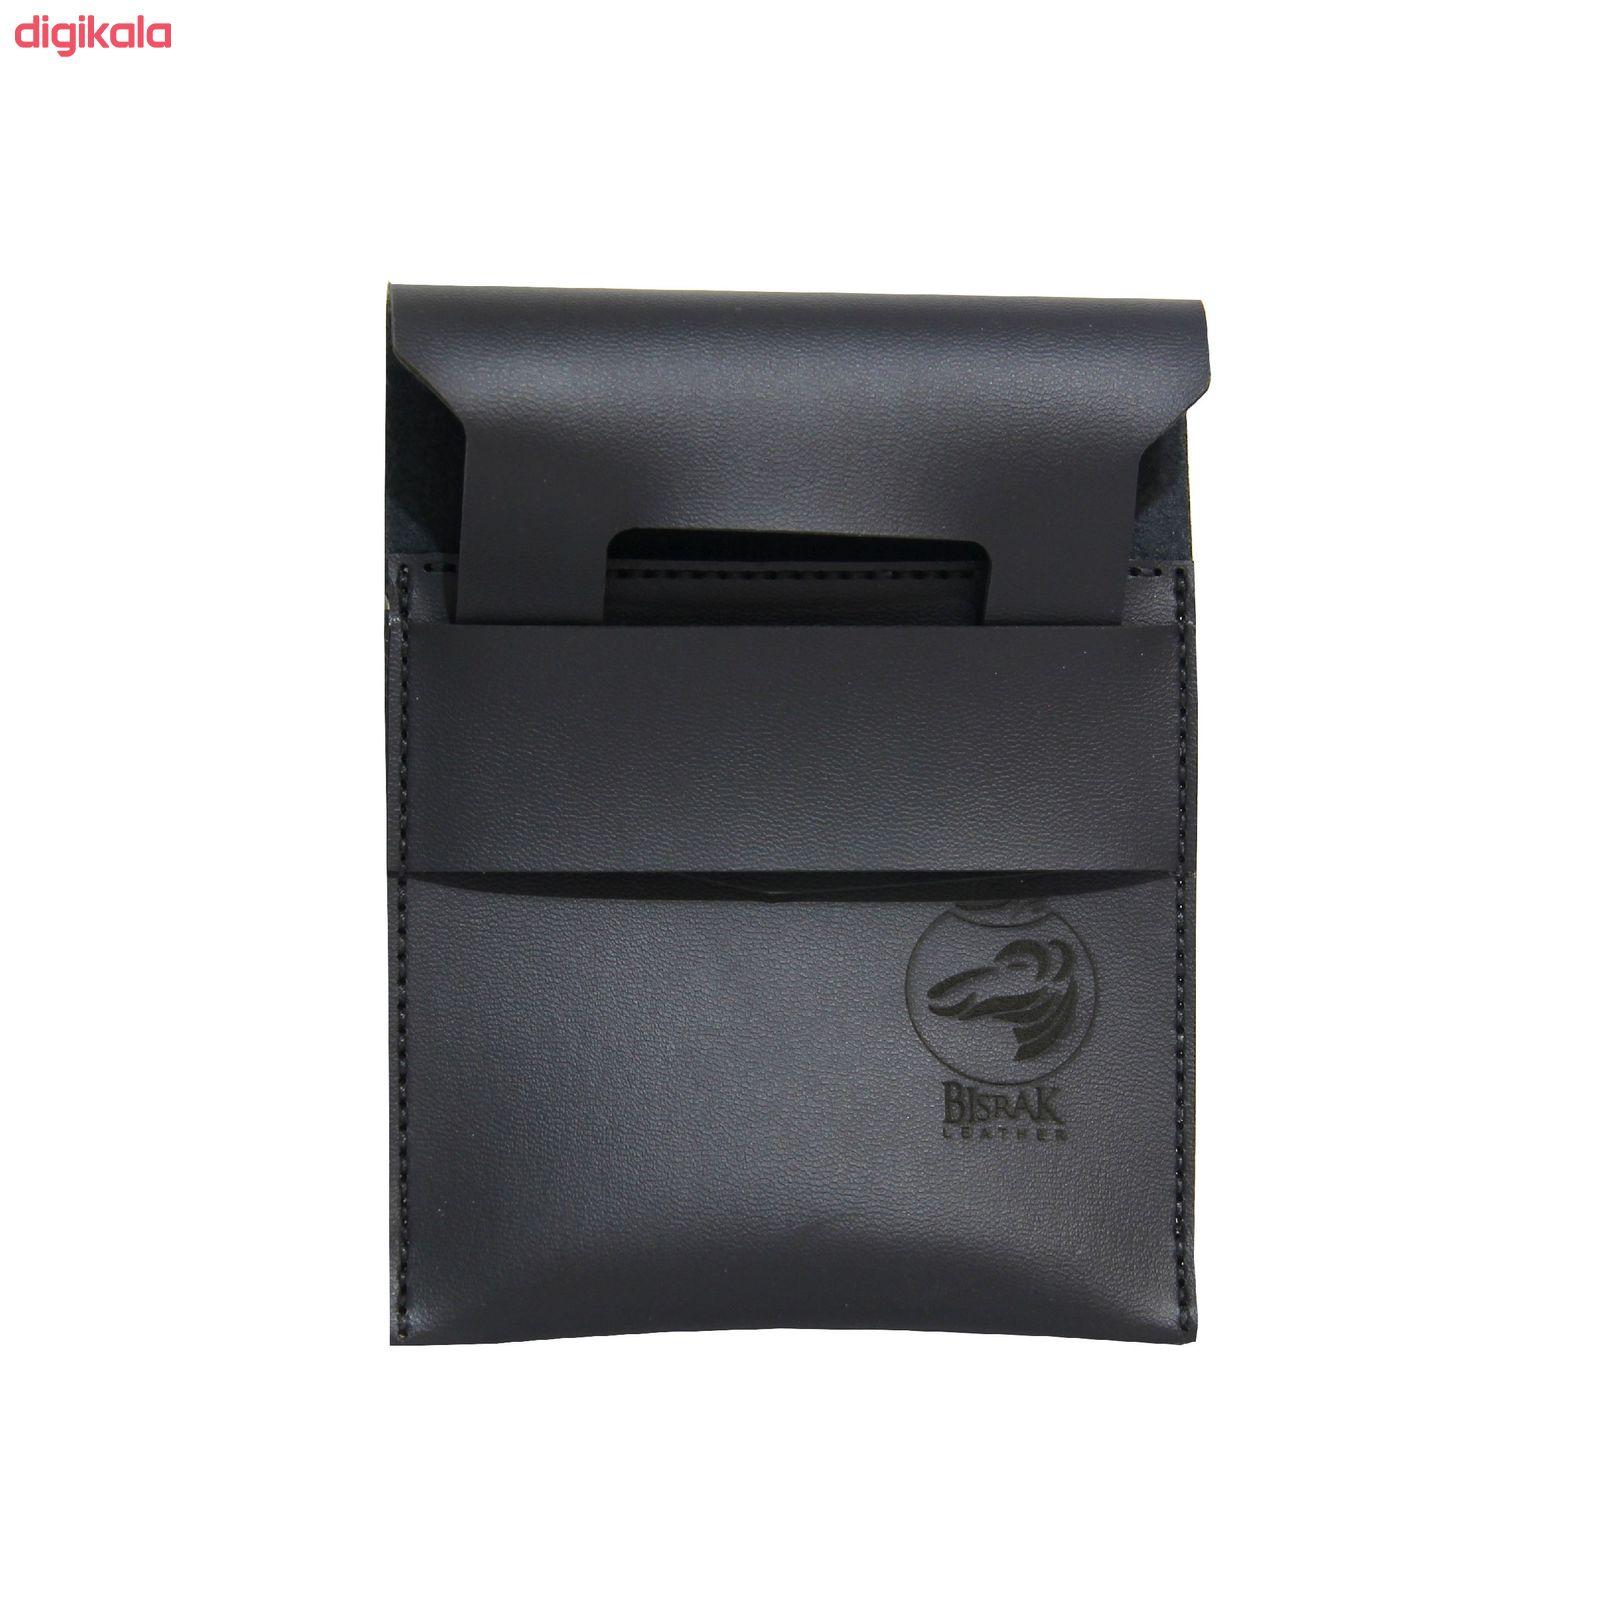 نگهدارنده گوشی موبایل چرم بیسراک کد N.Char-201 main 1 10